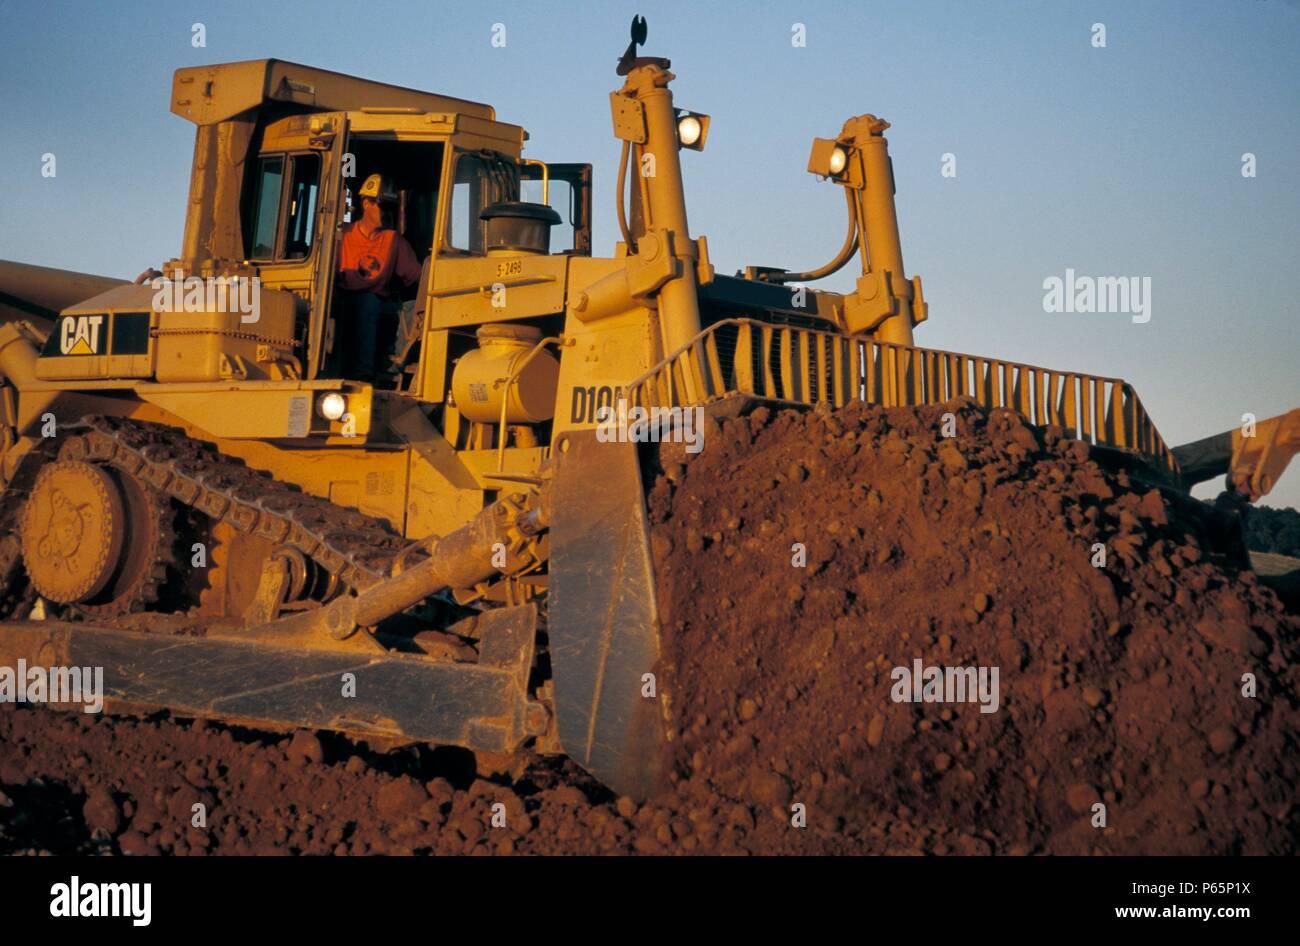 Bulldozer pushing dirt for large housing development in California< USA Stock Photo